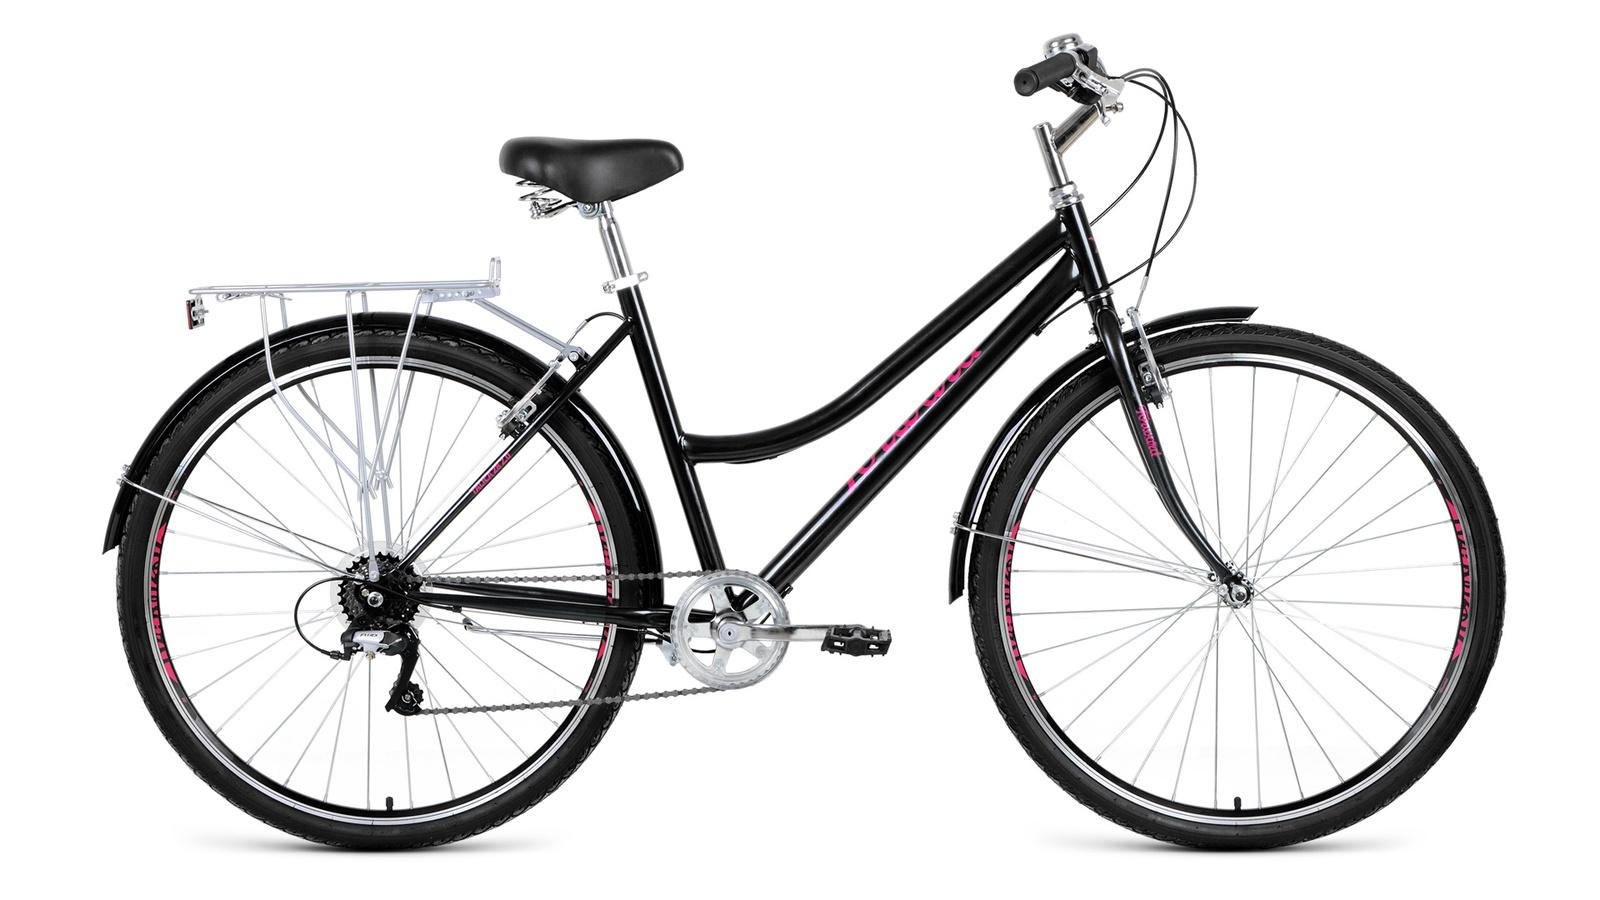 Велосипед Forward Talica 28 2.0, черный велосипед forward barcelona 1 0 2017